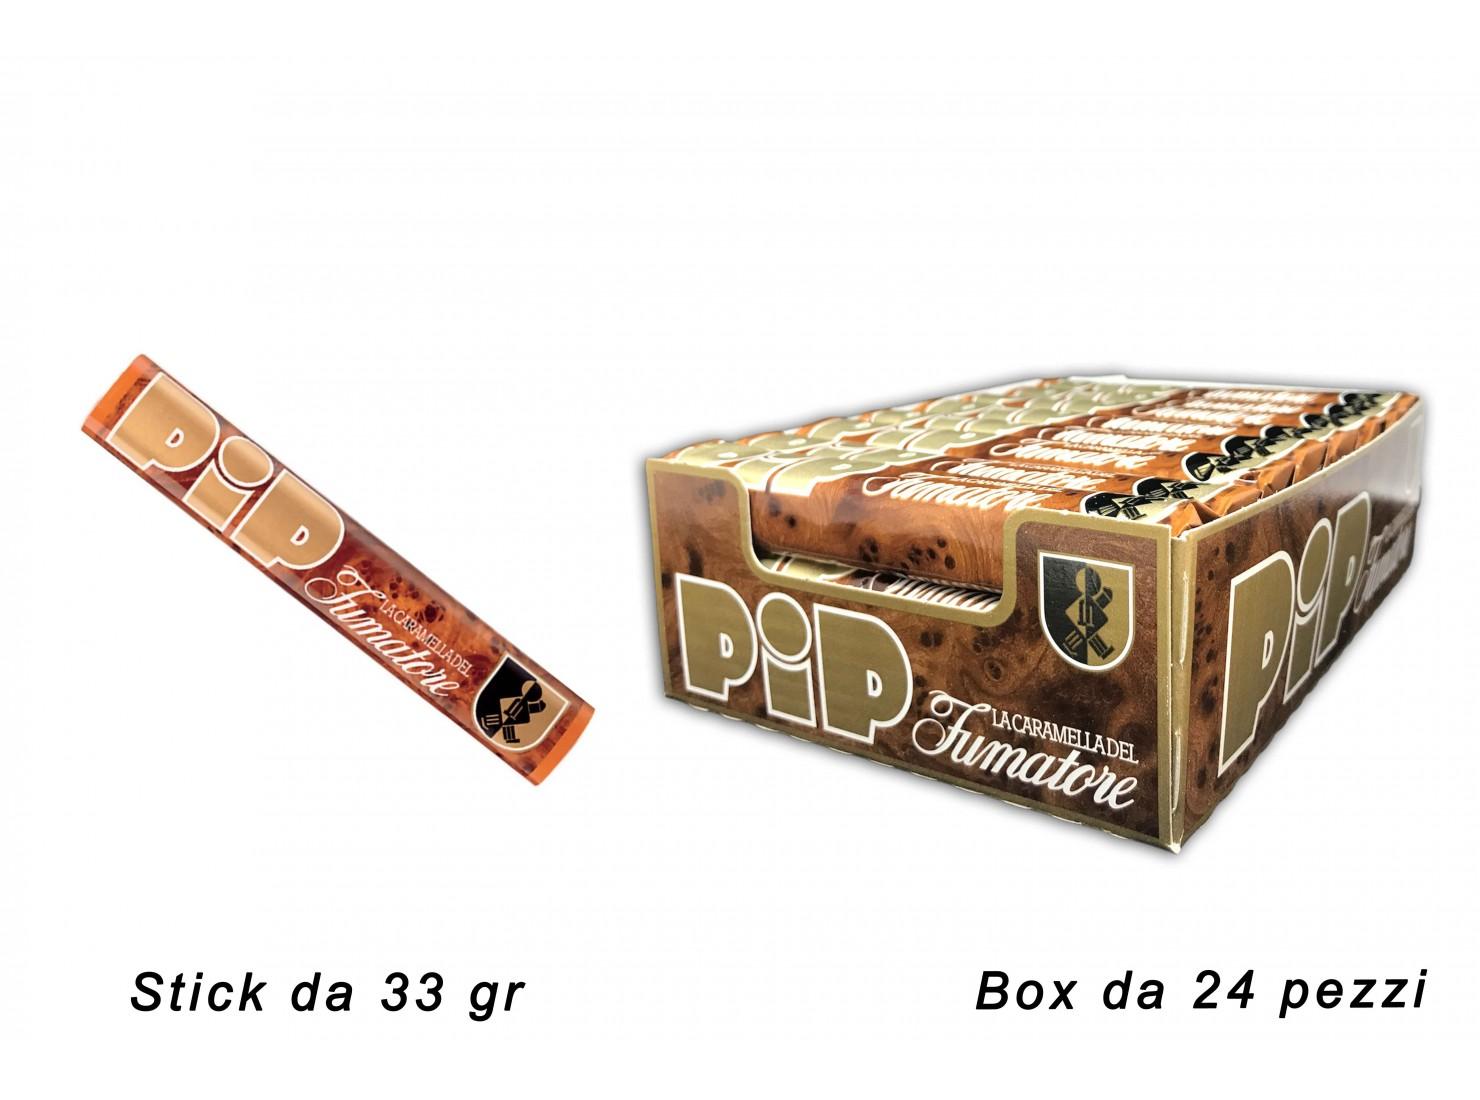 PIP FUMATORE STICK 33 GR